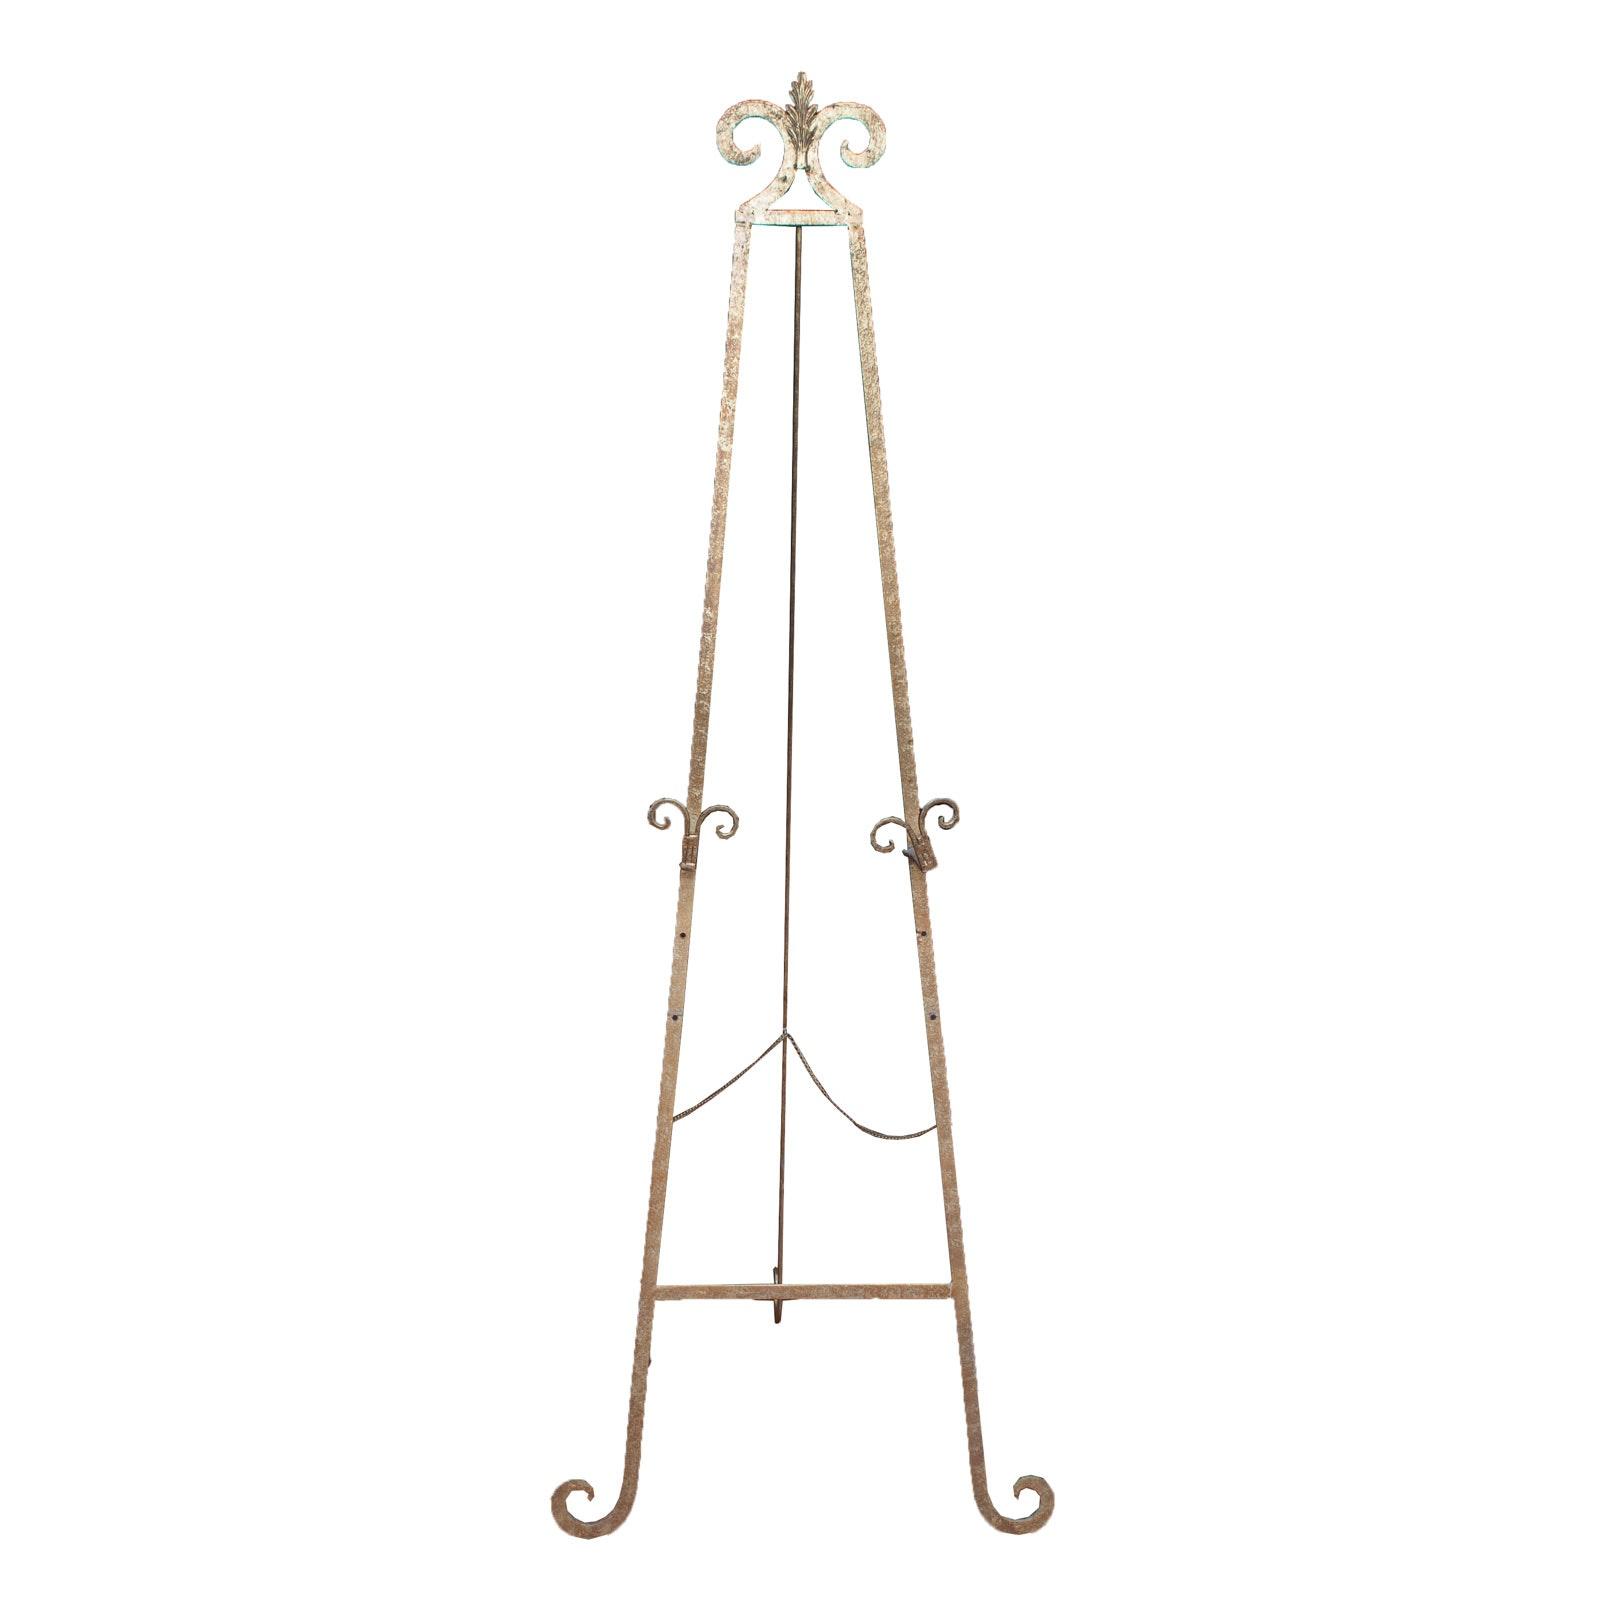 Brass Tone Metal Floor Standing Tripod Art Easel